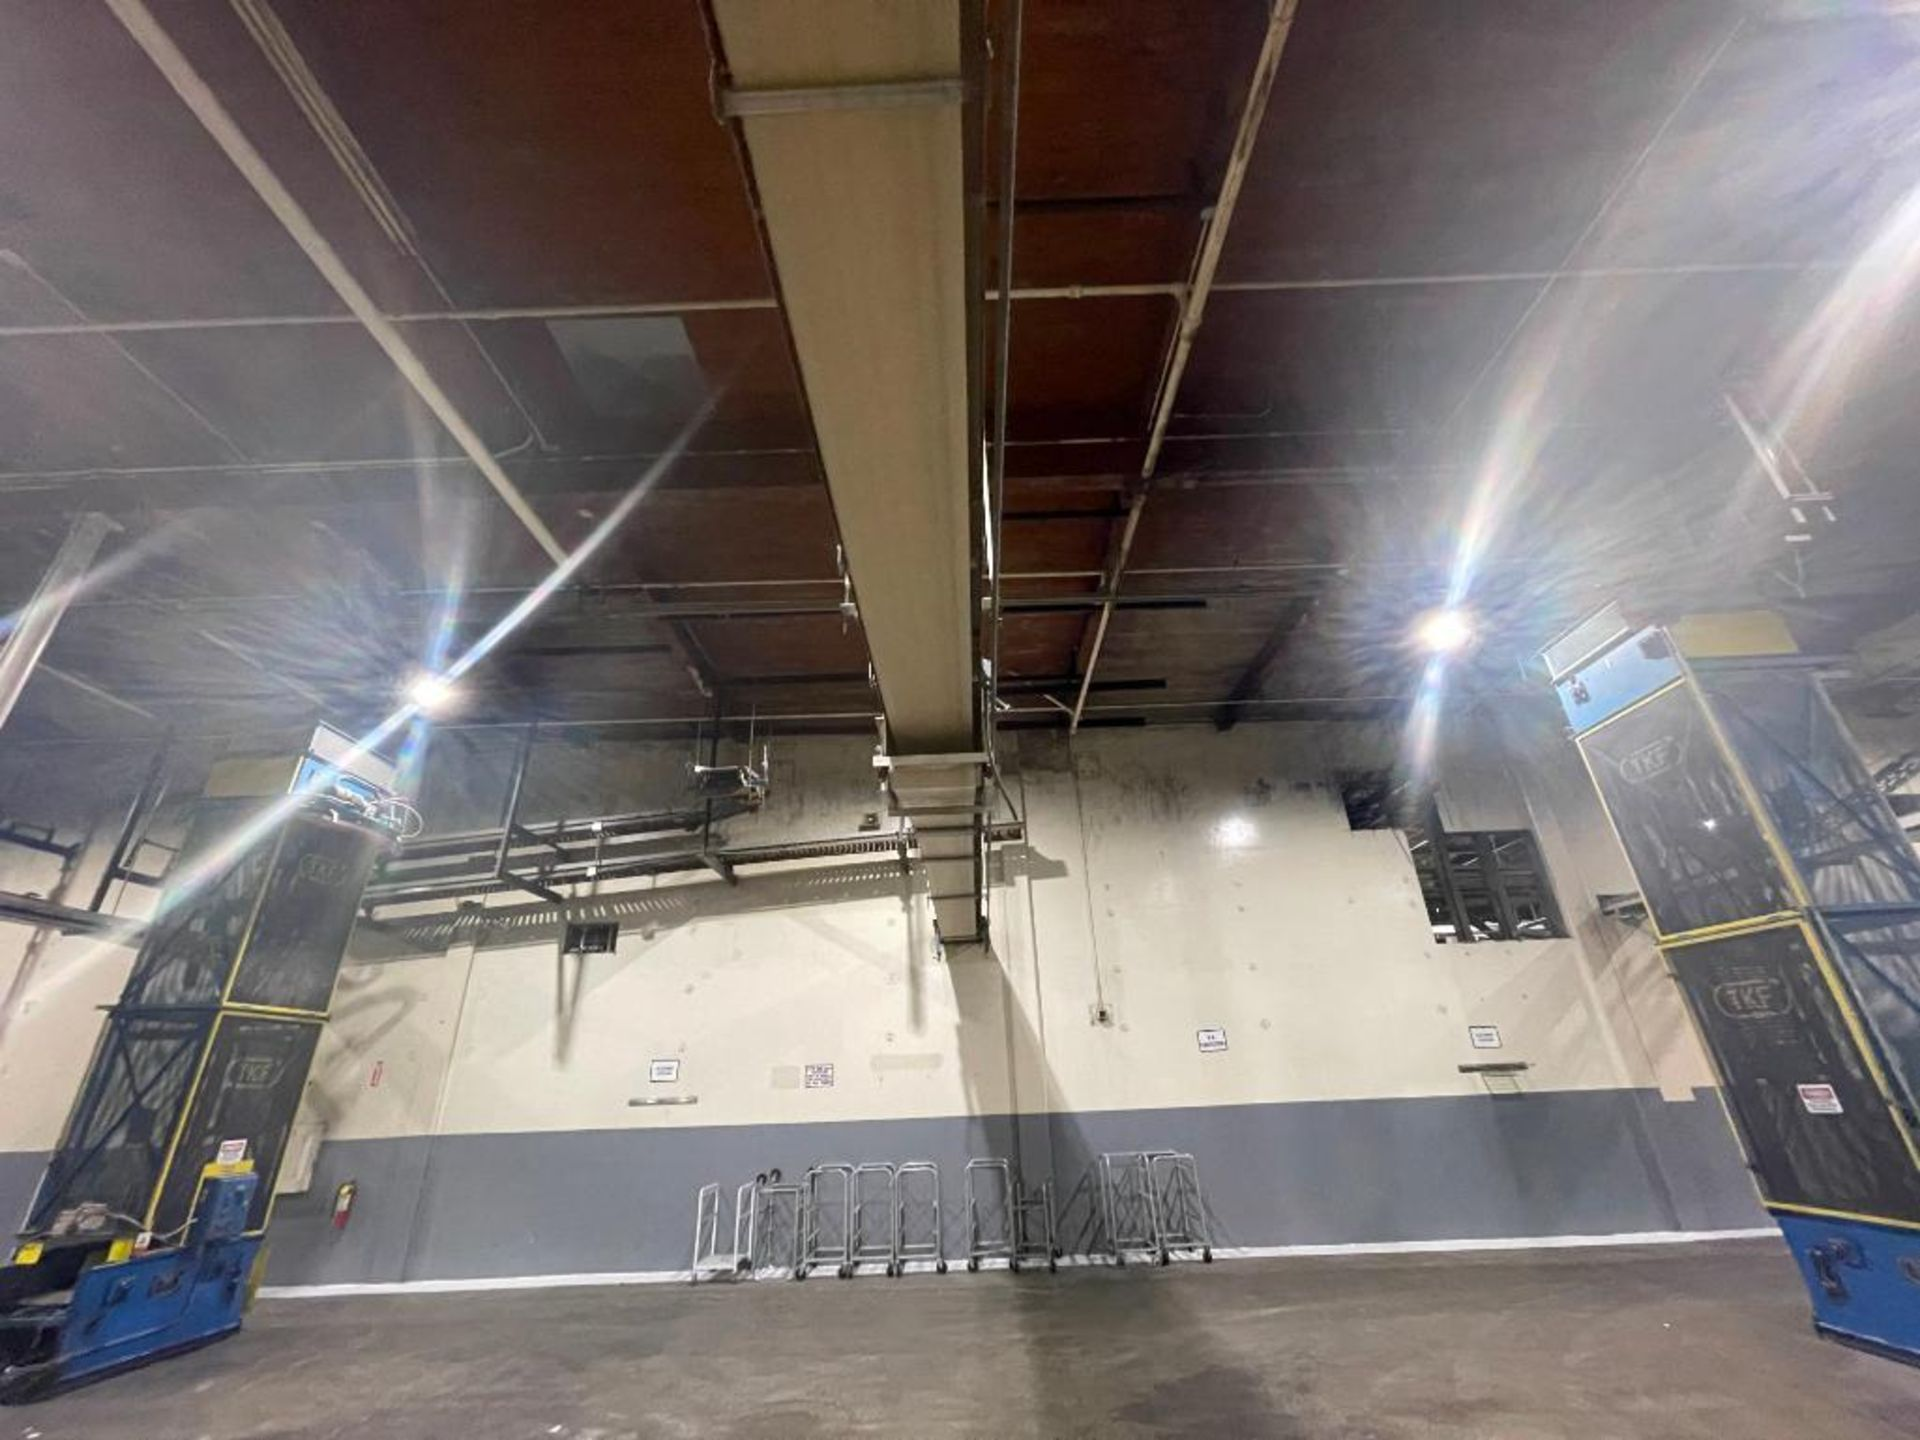 4 Aseeco mild steel conveyors - Image 10 of 14